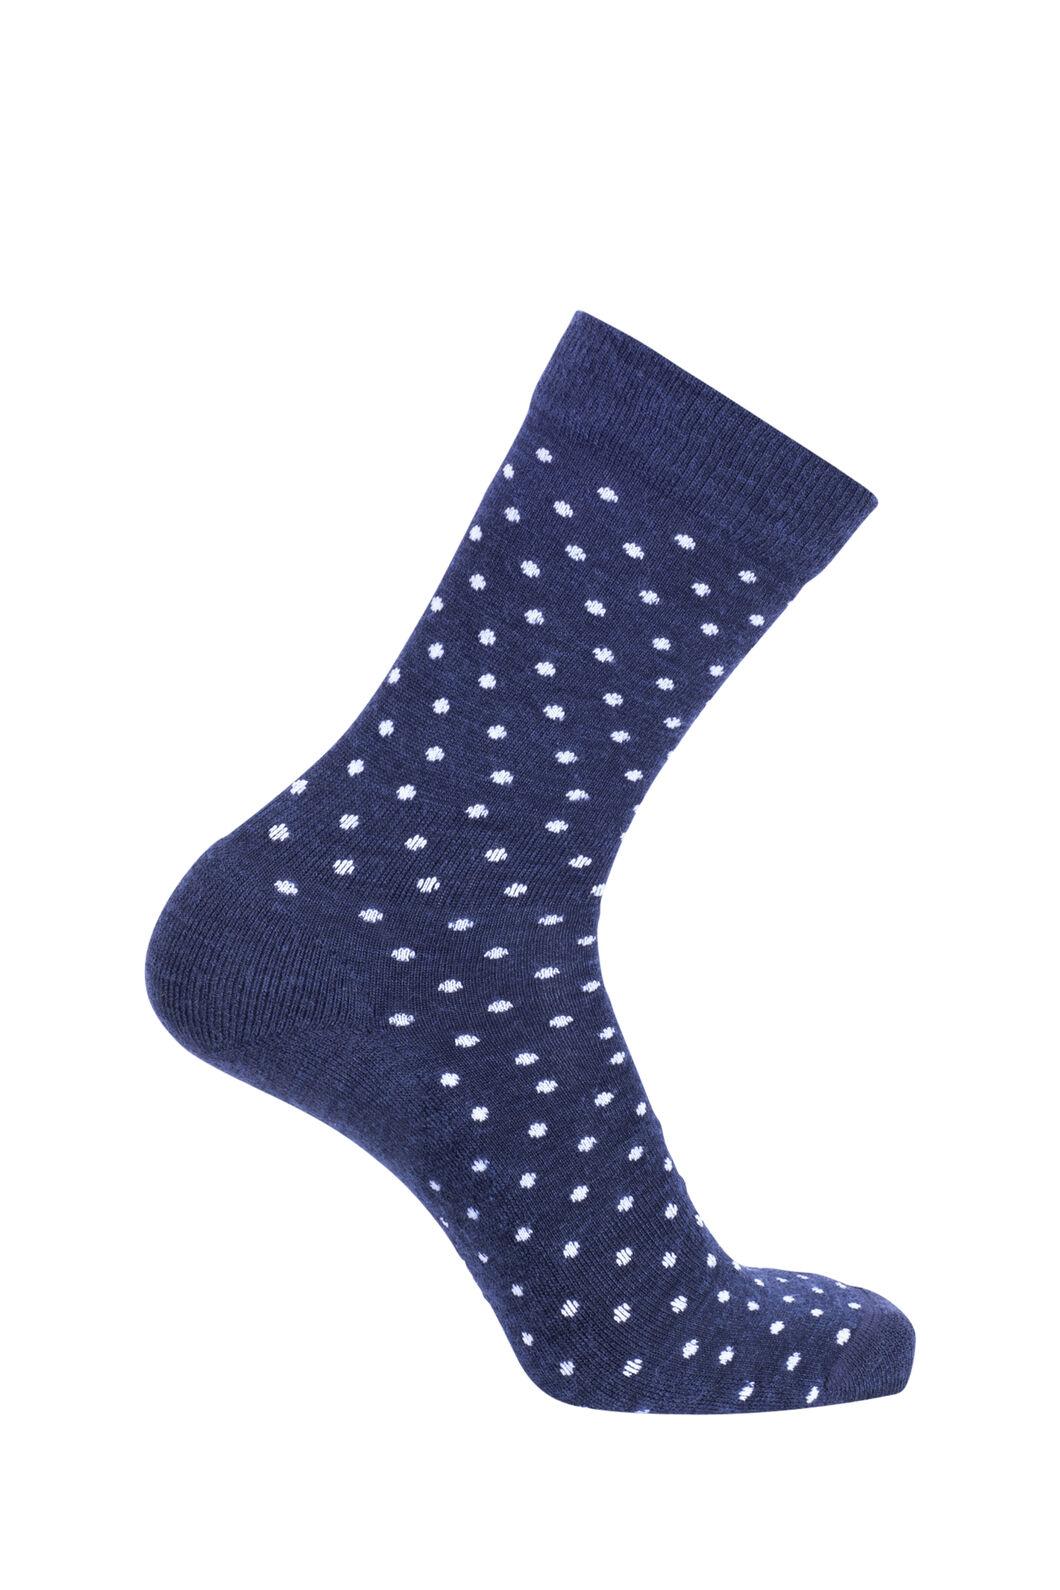 Macpac Merino Blend Footprint Socks, Black Iris Polka, hi-res